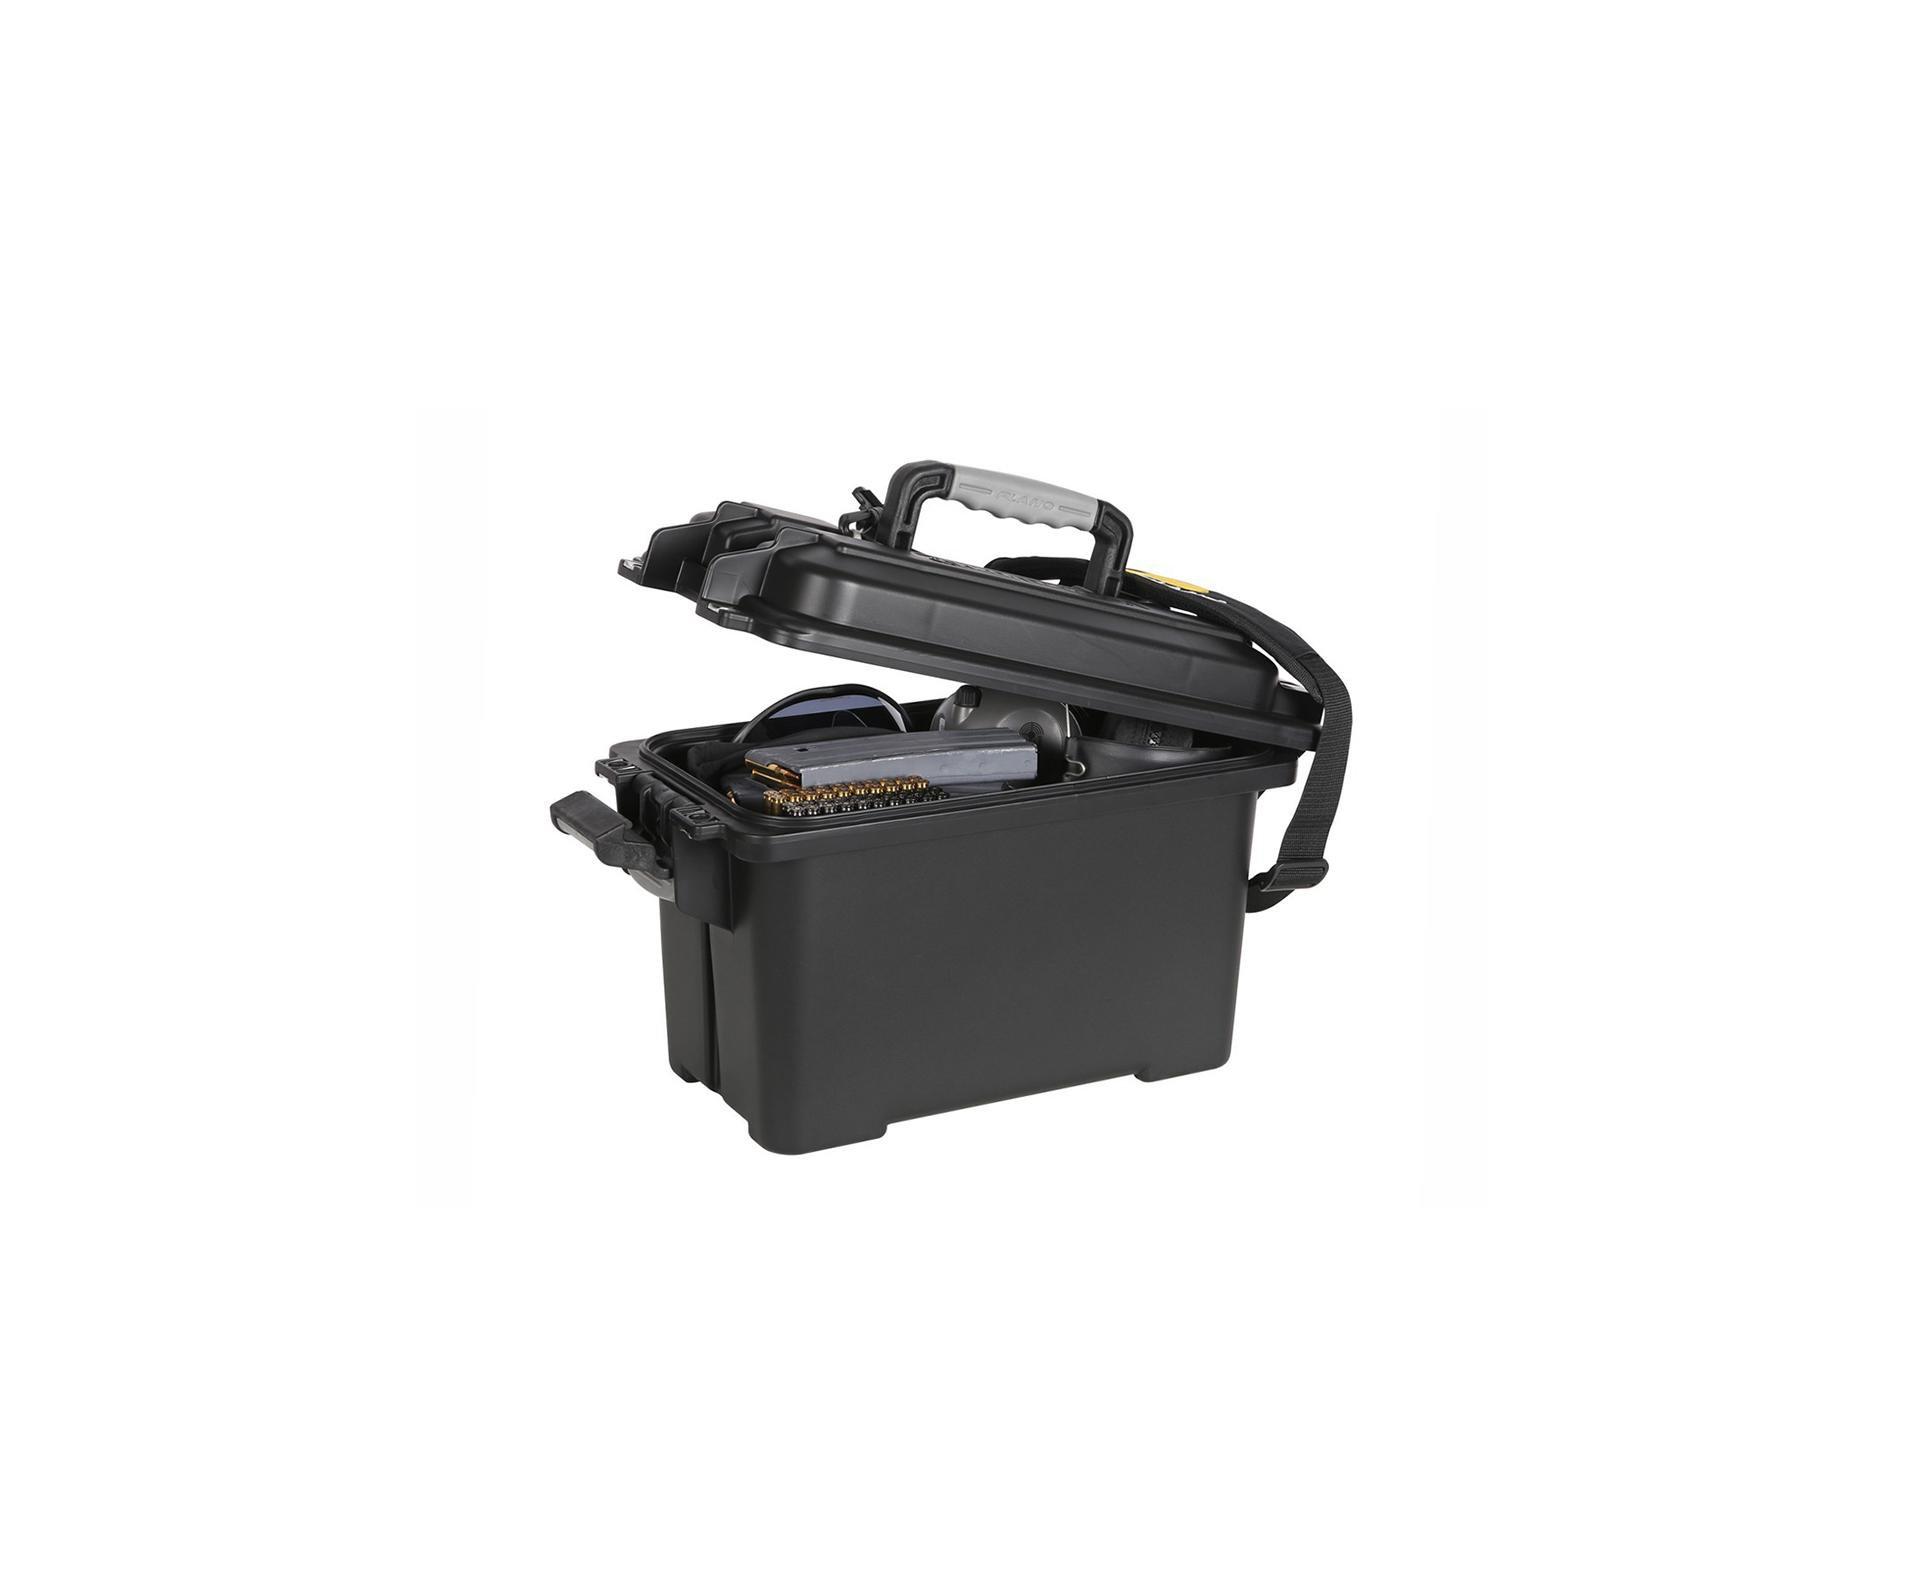 Caixa/case Plano Para Arma E Acessórios (109160) Field Locker Ammo